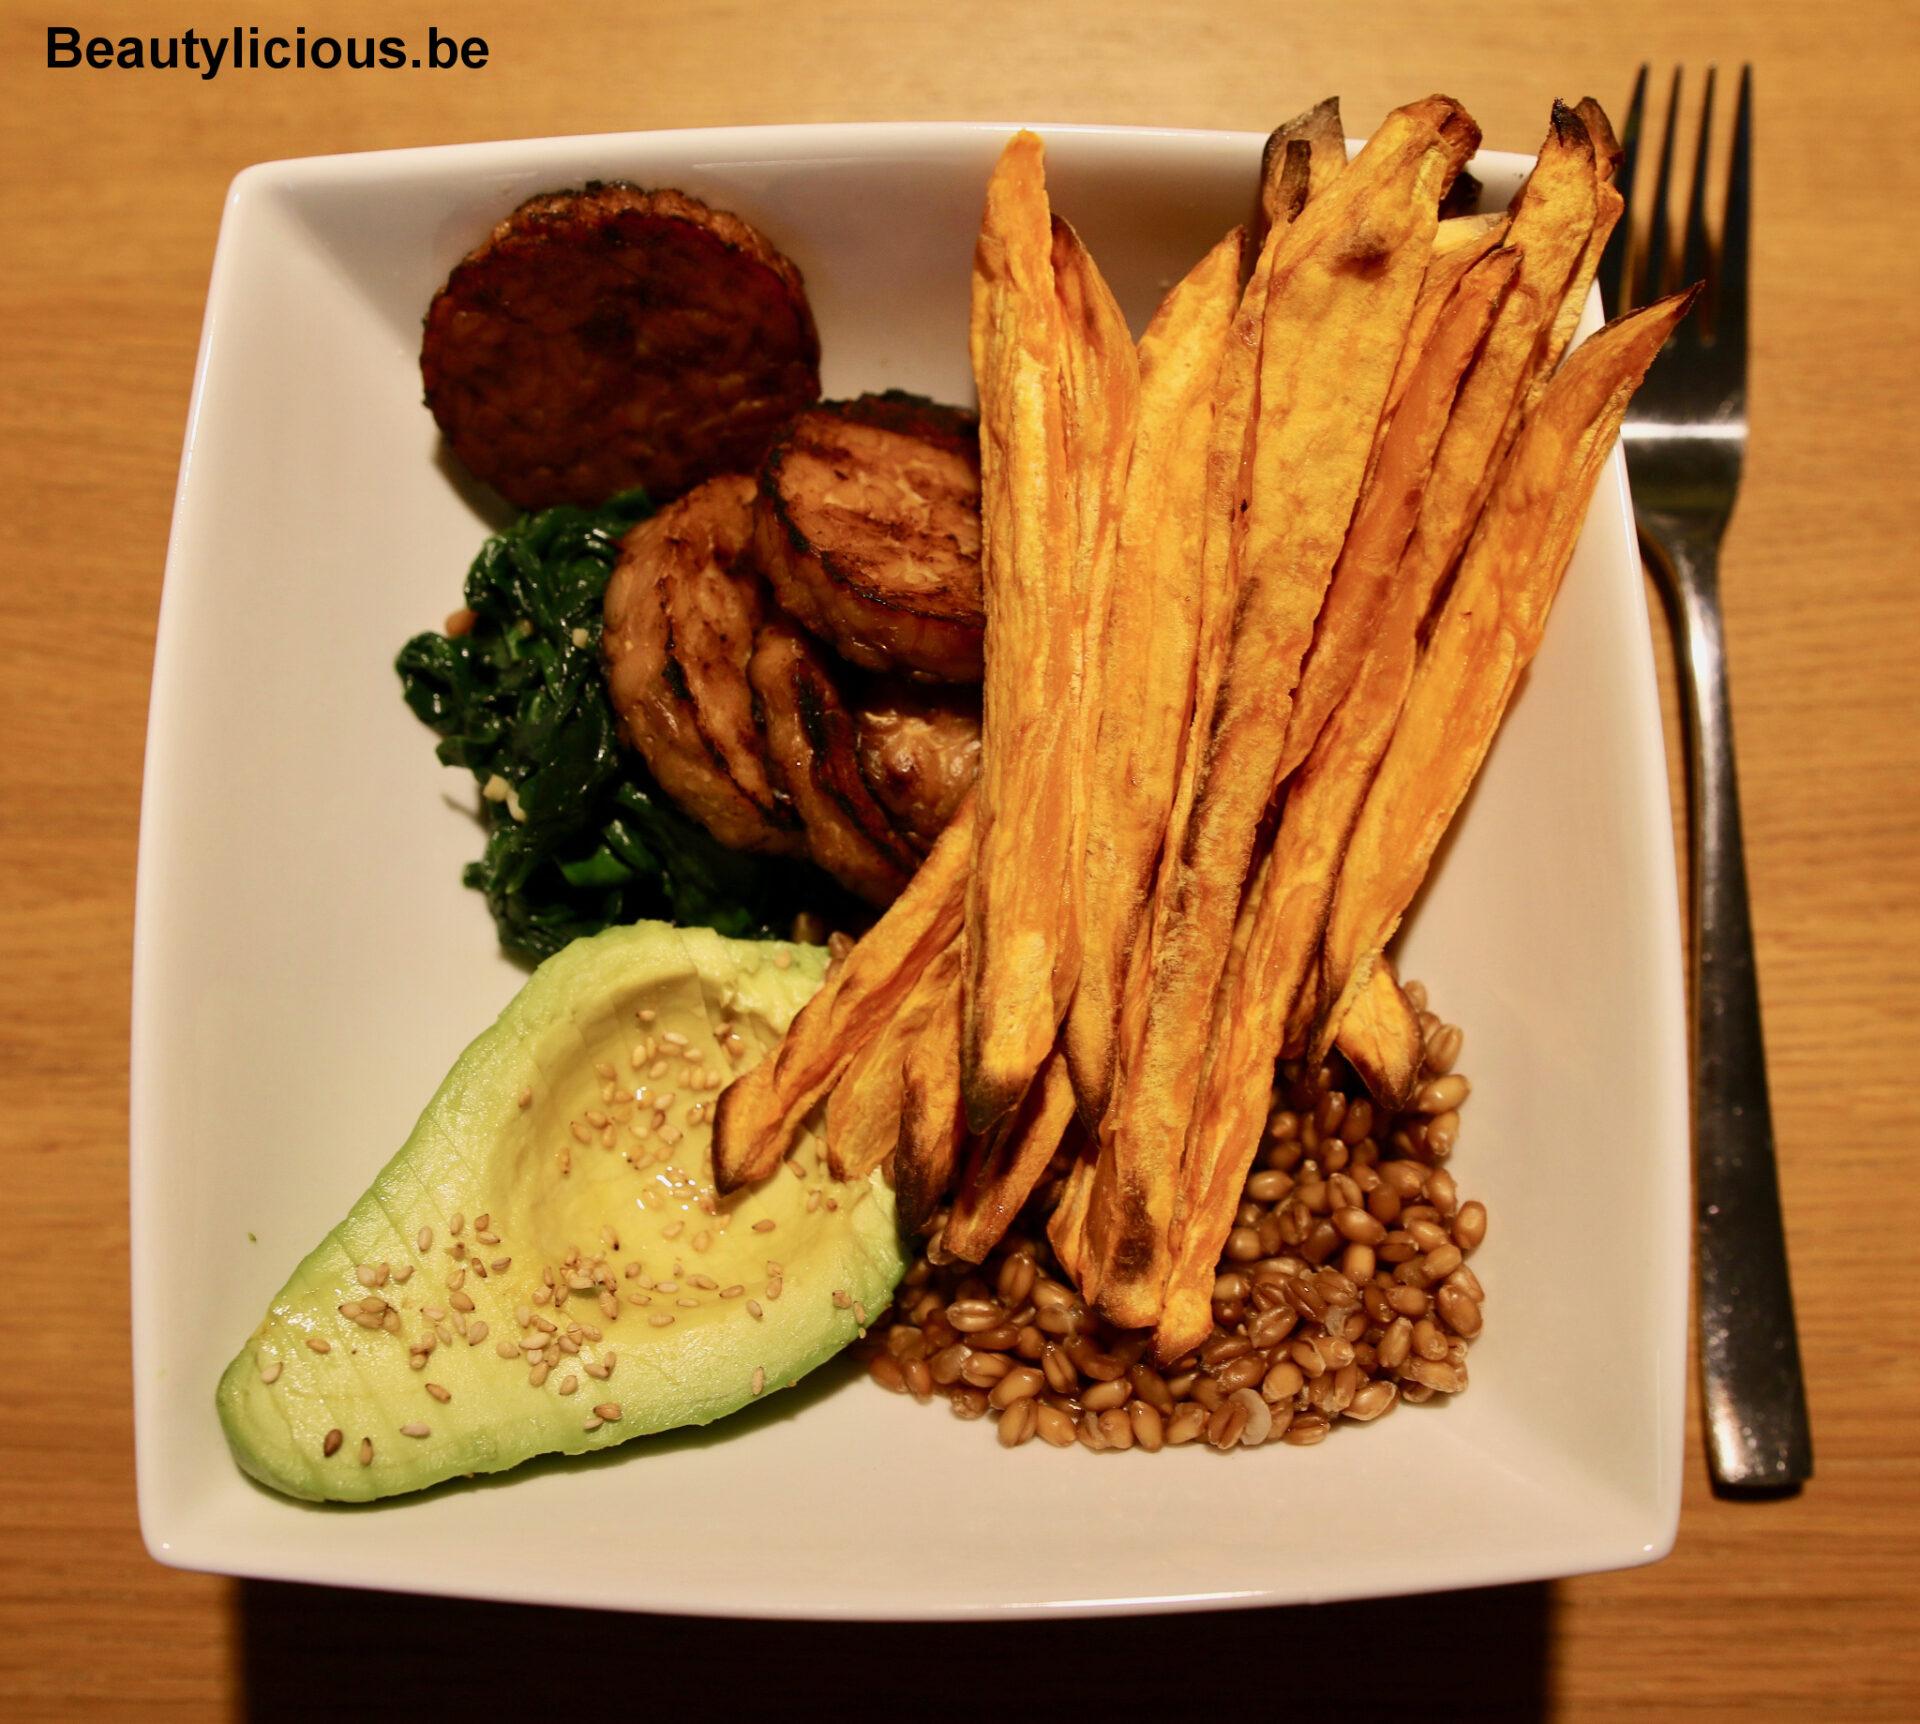 Exemple de plat vegan de mon menu hebdomadaire